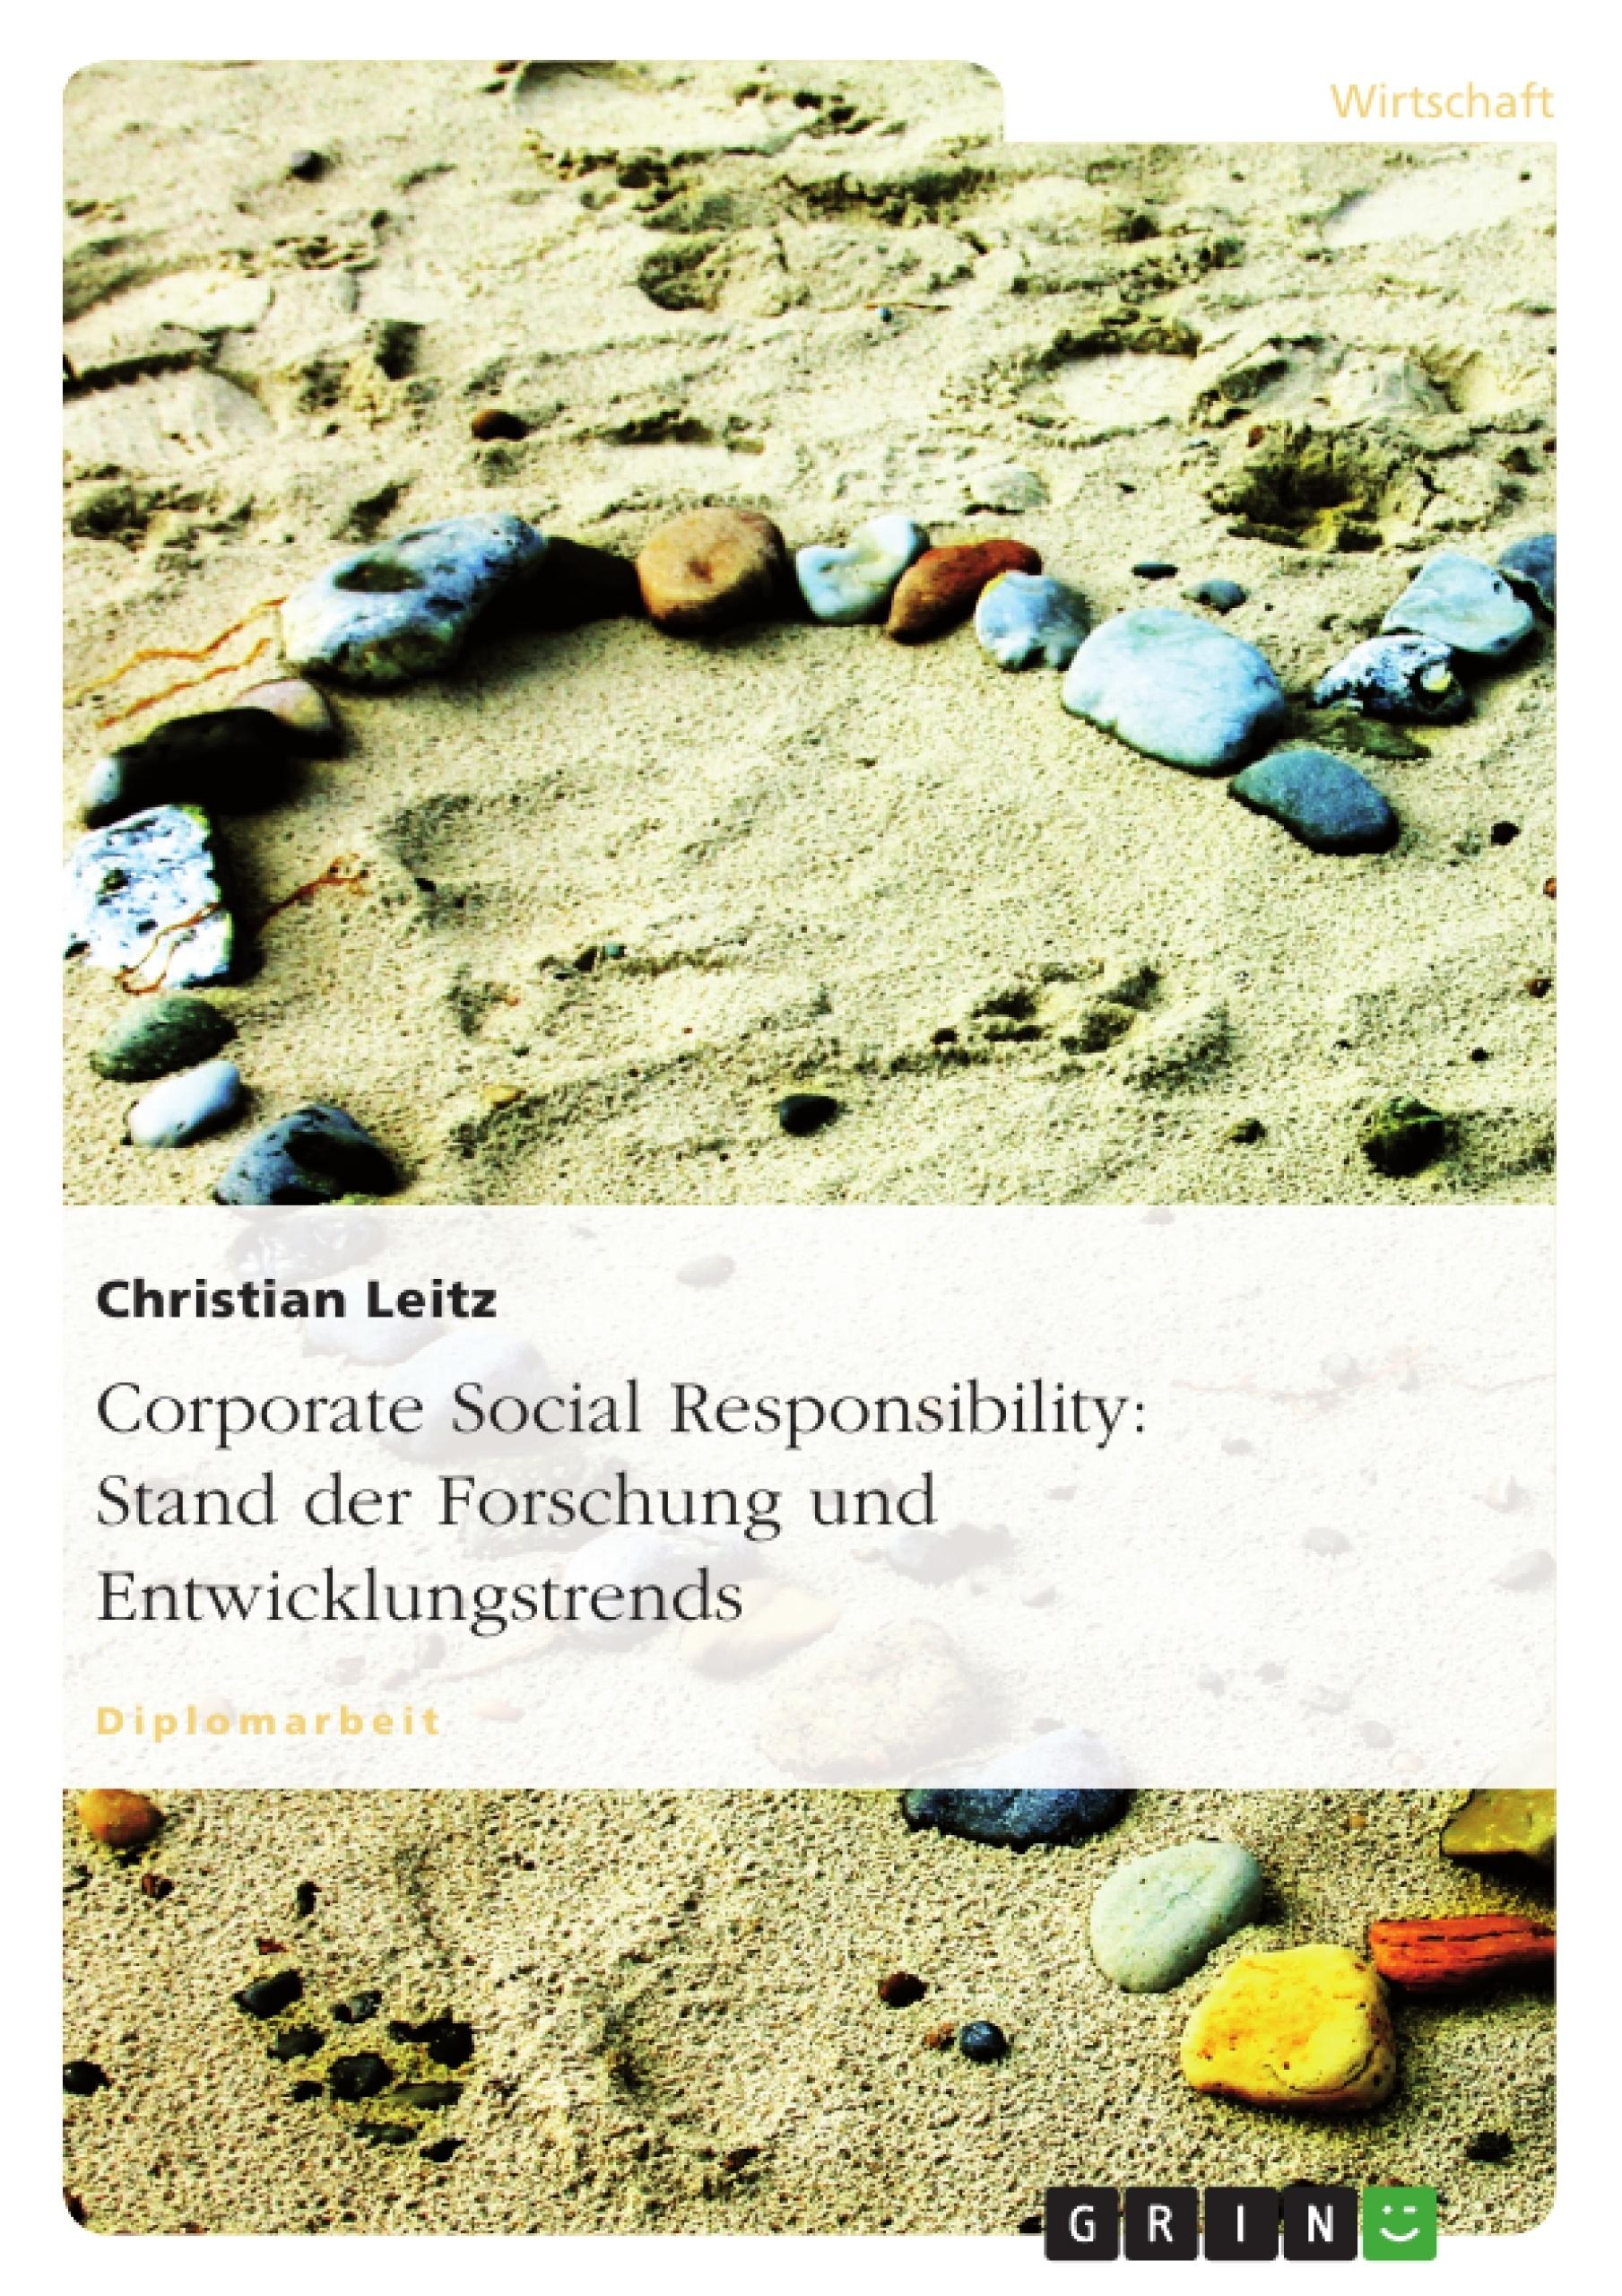 Titel: Corporate Social Responsibility: Stand der Forschung und Entwicklungstrends